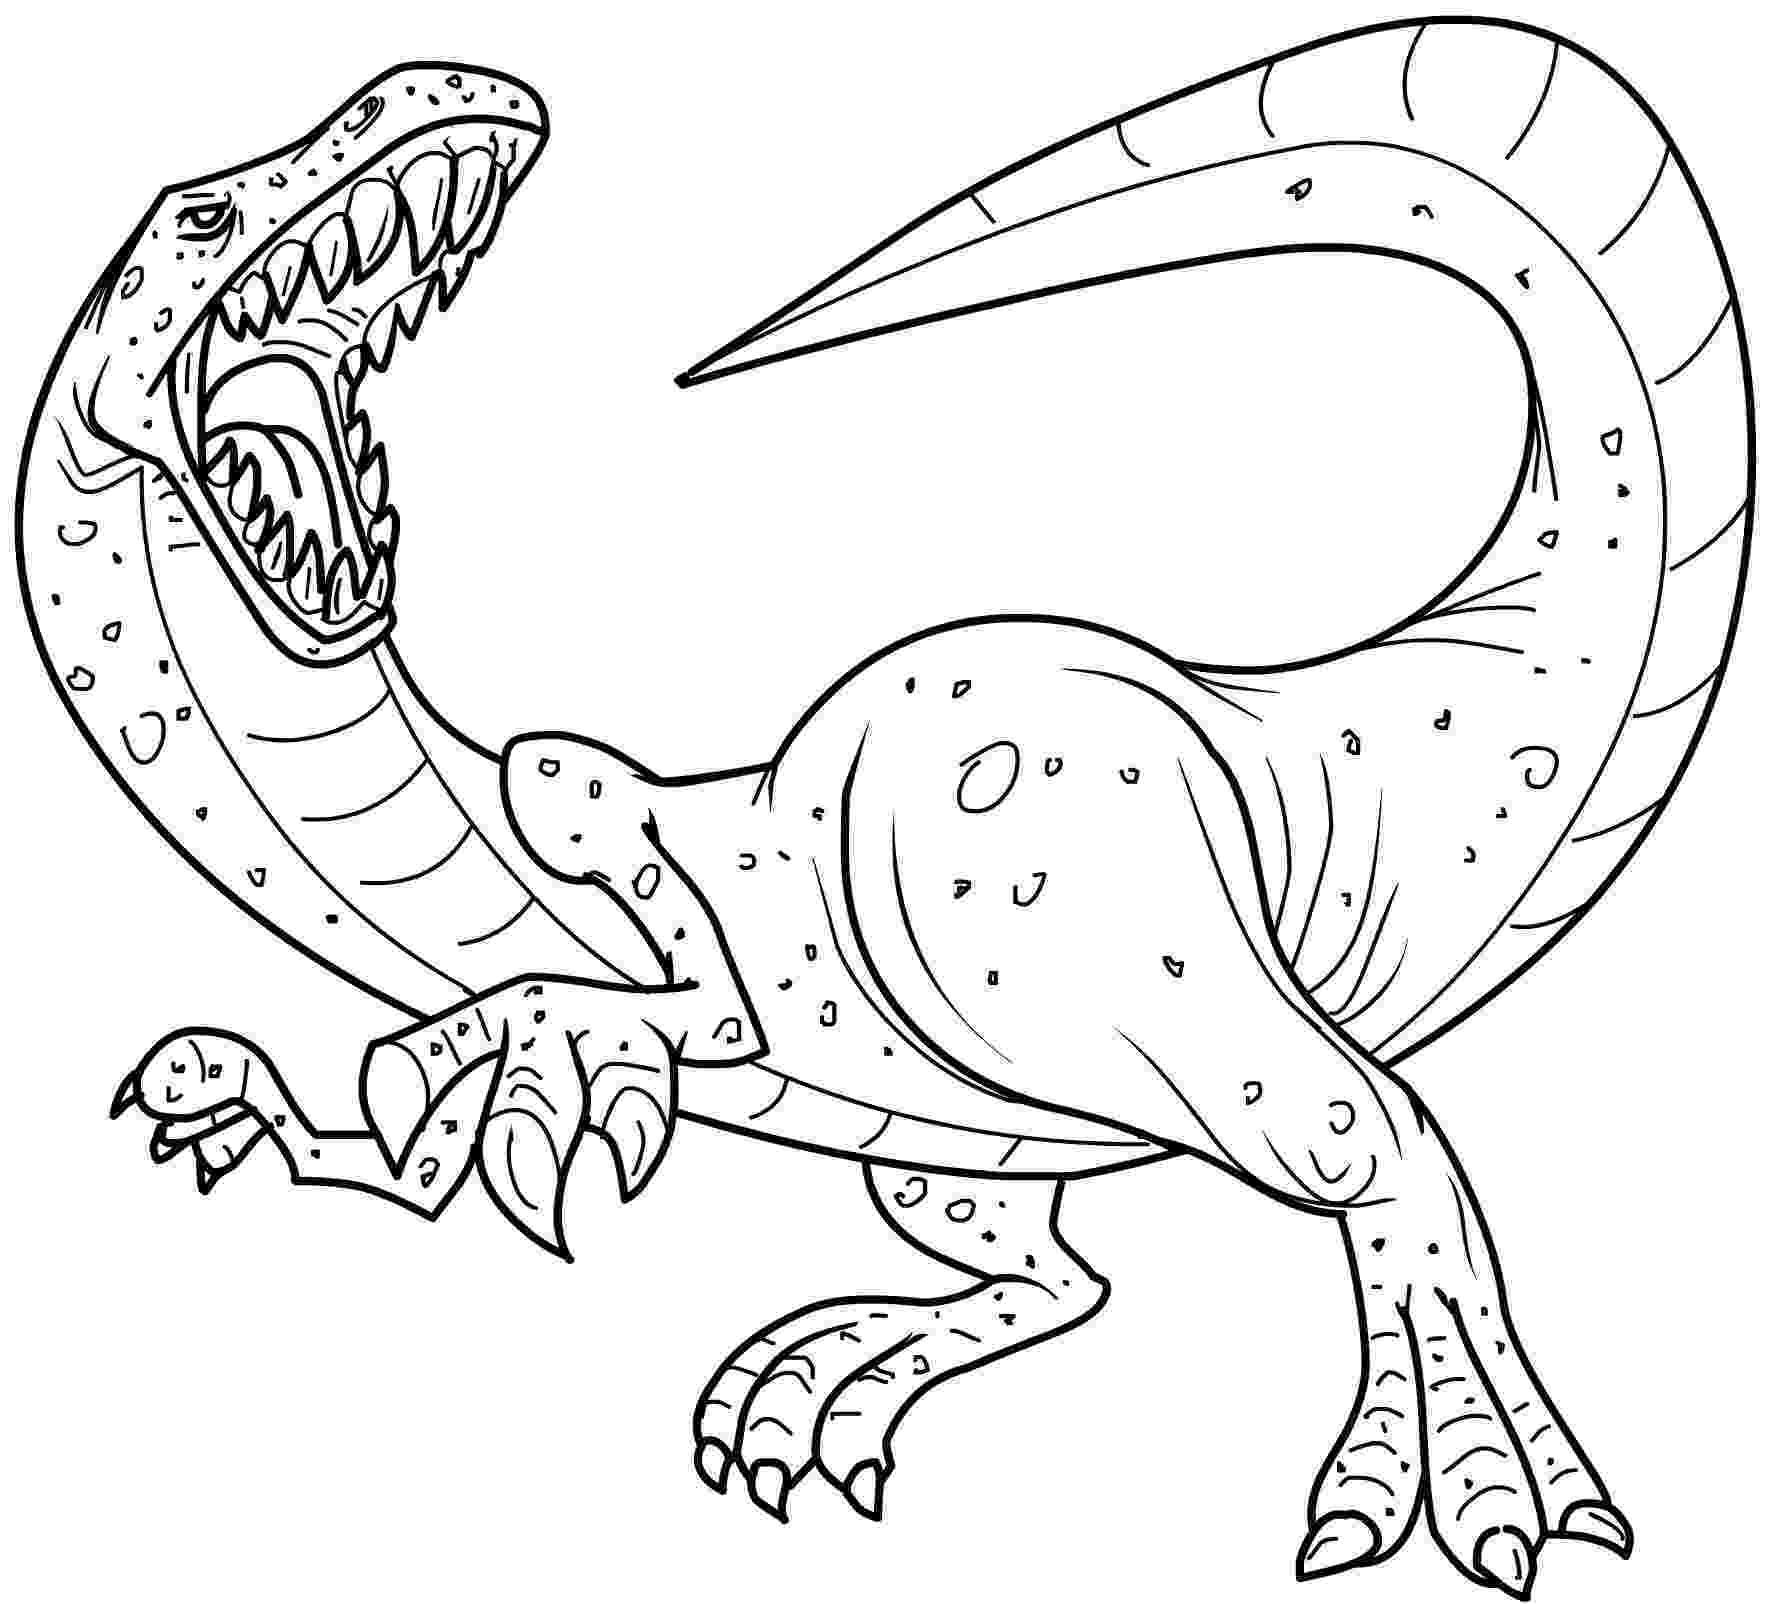 free dinosaur printables dinosaur coloring pages free printable pictures coloring free dinosaur printables